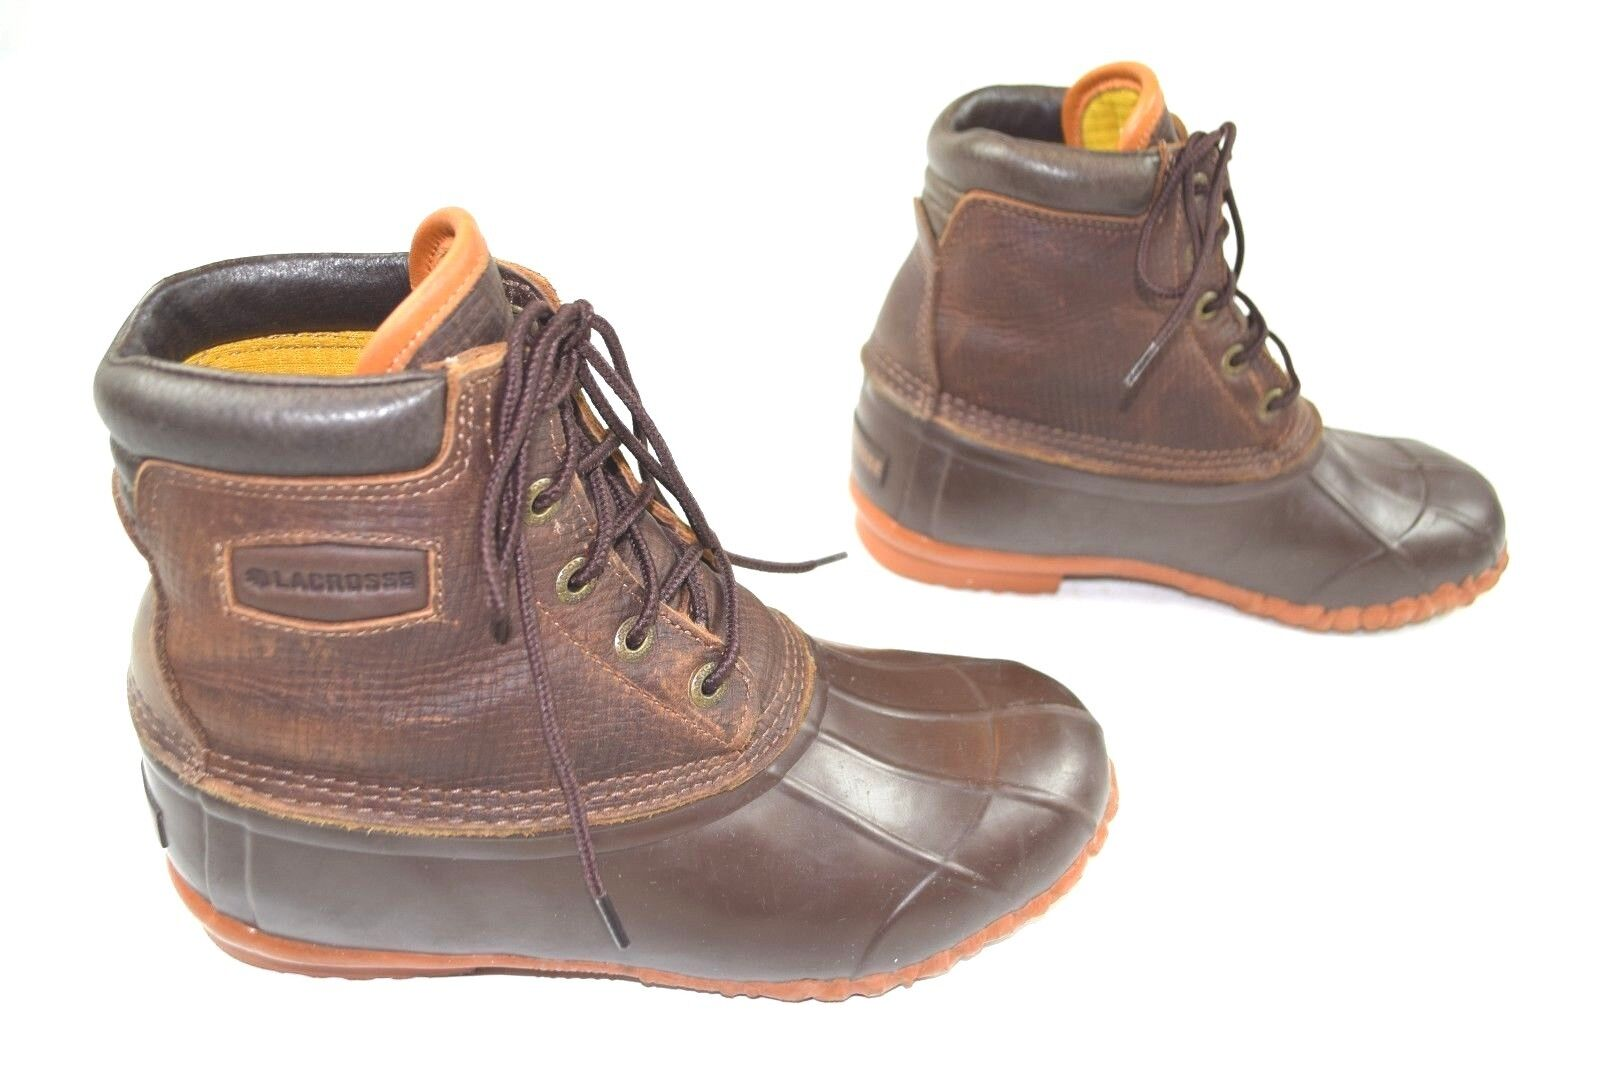 Bottes LaCrosse Duck bottes 5 Eye Cuir CIP 424502 Sz 8 Imperméable Cuir Nice